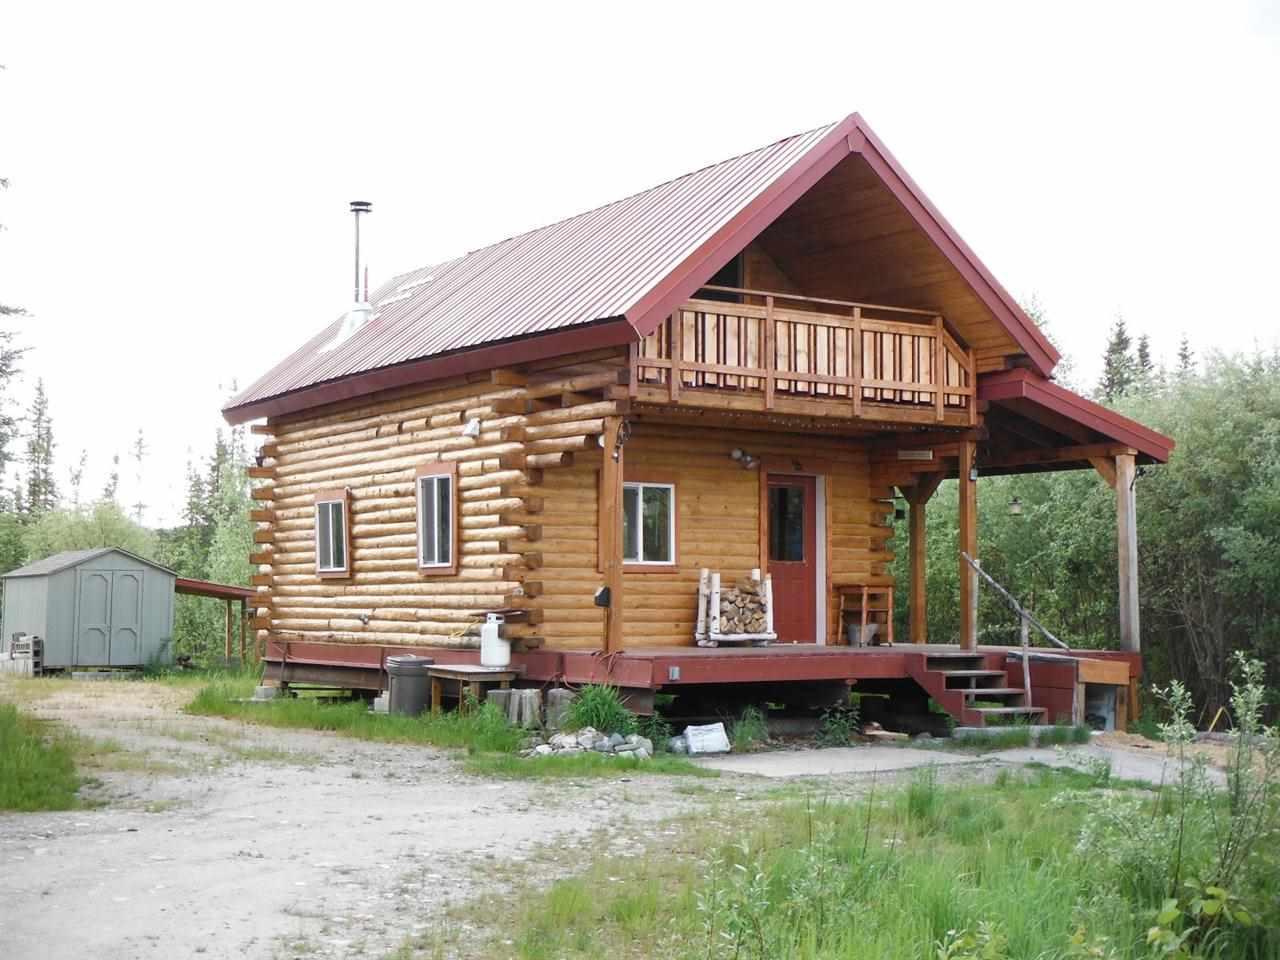 980 Maura St, Fairbanks, AK 99709